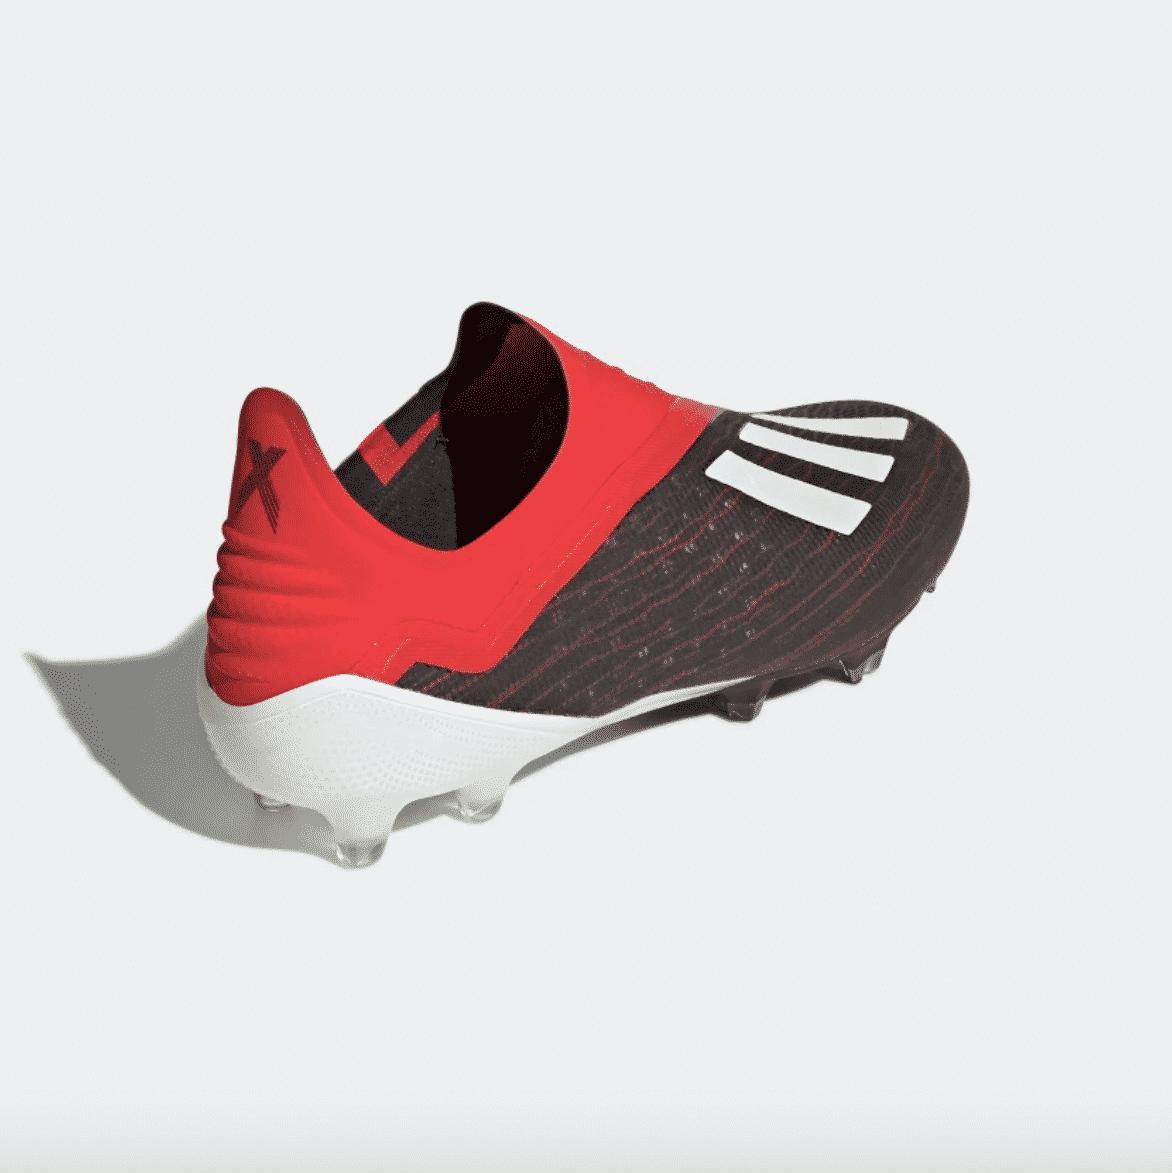 adidas-x-18+-initiator-pack-3